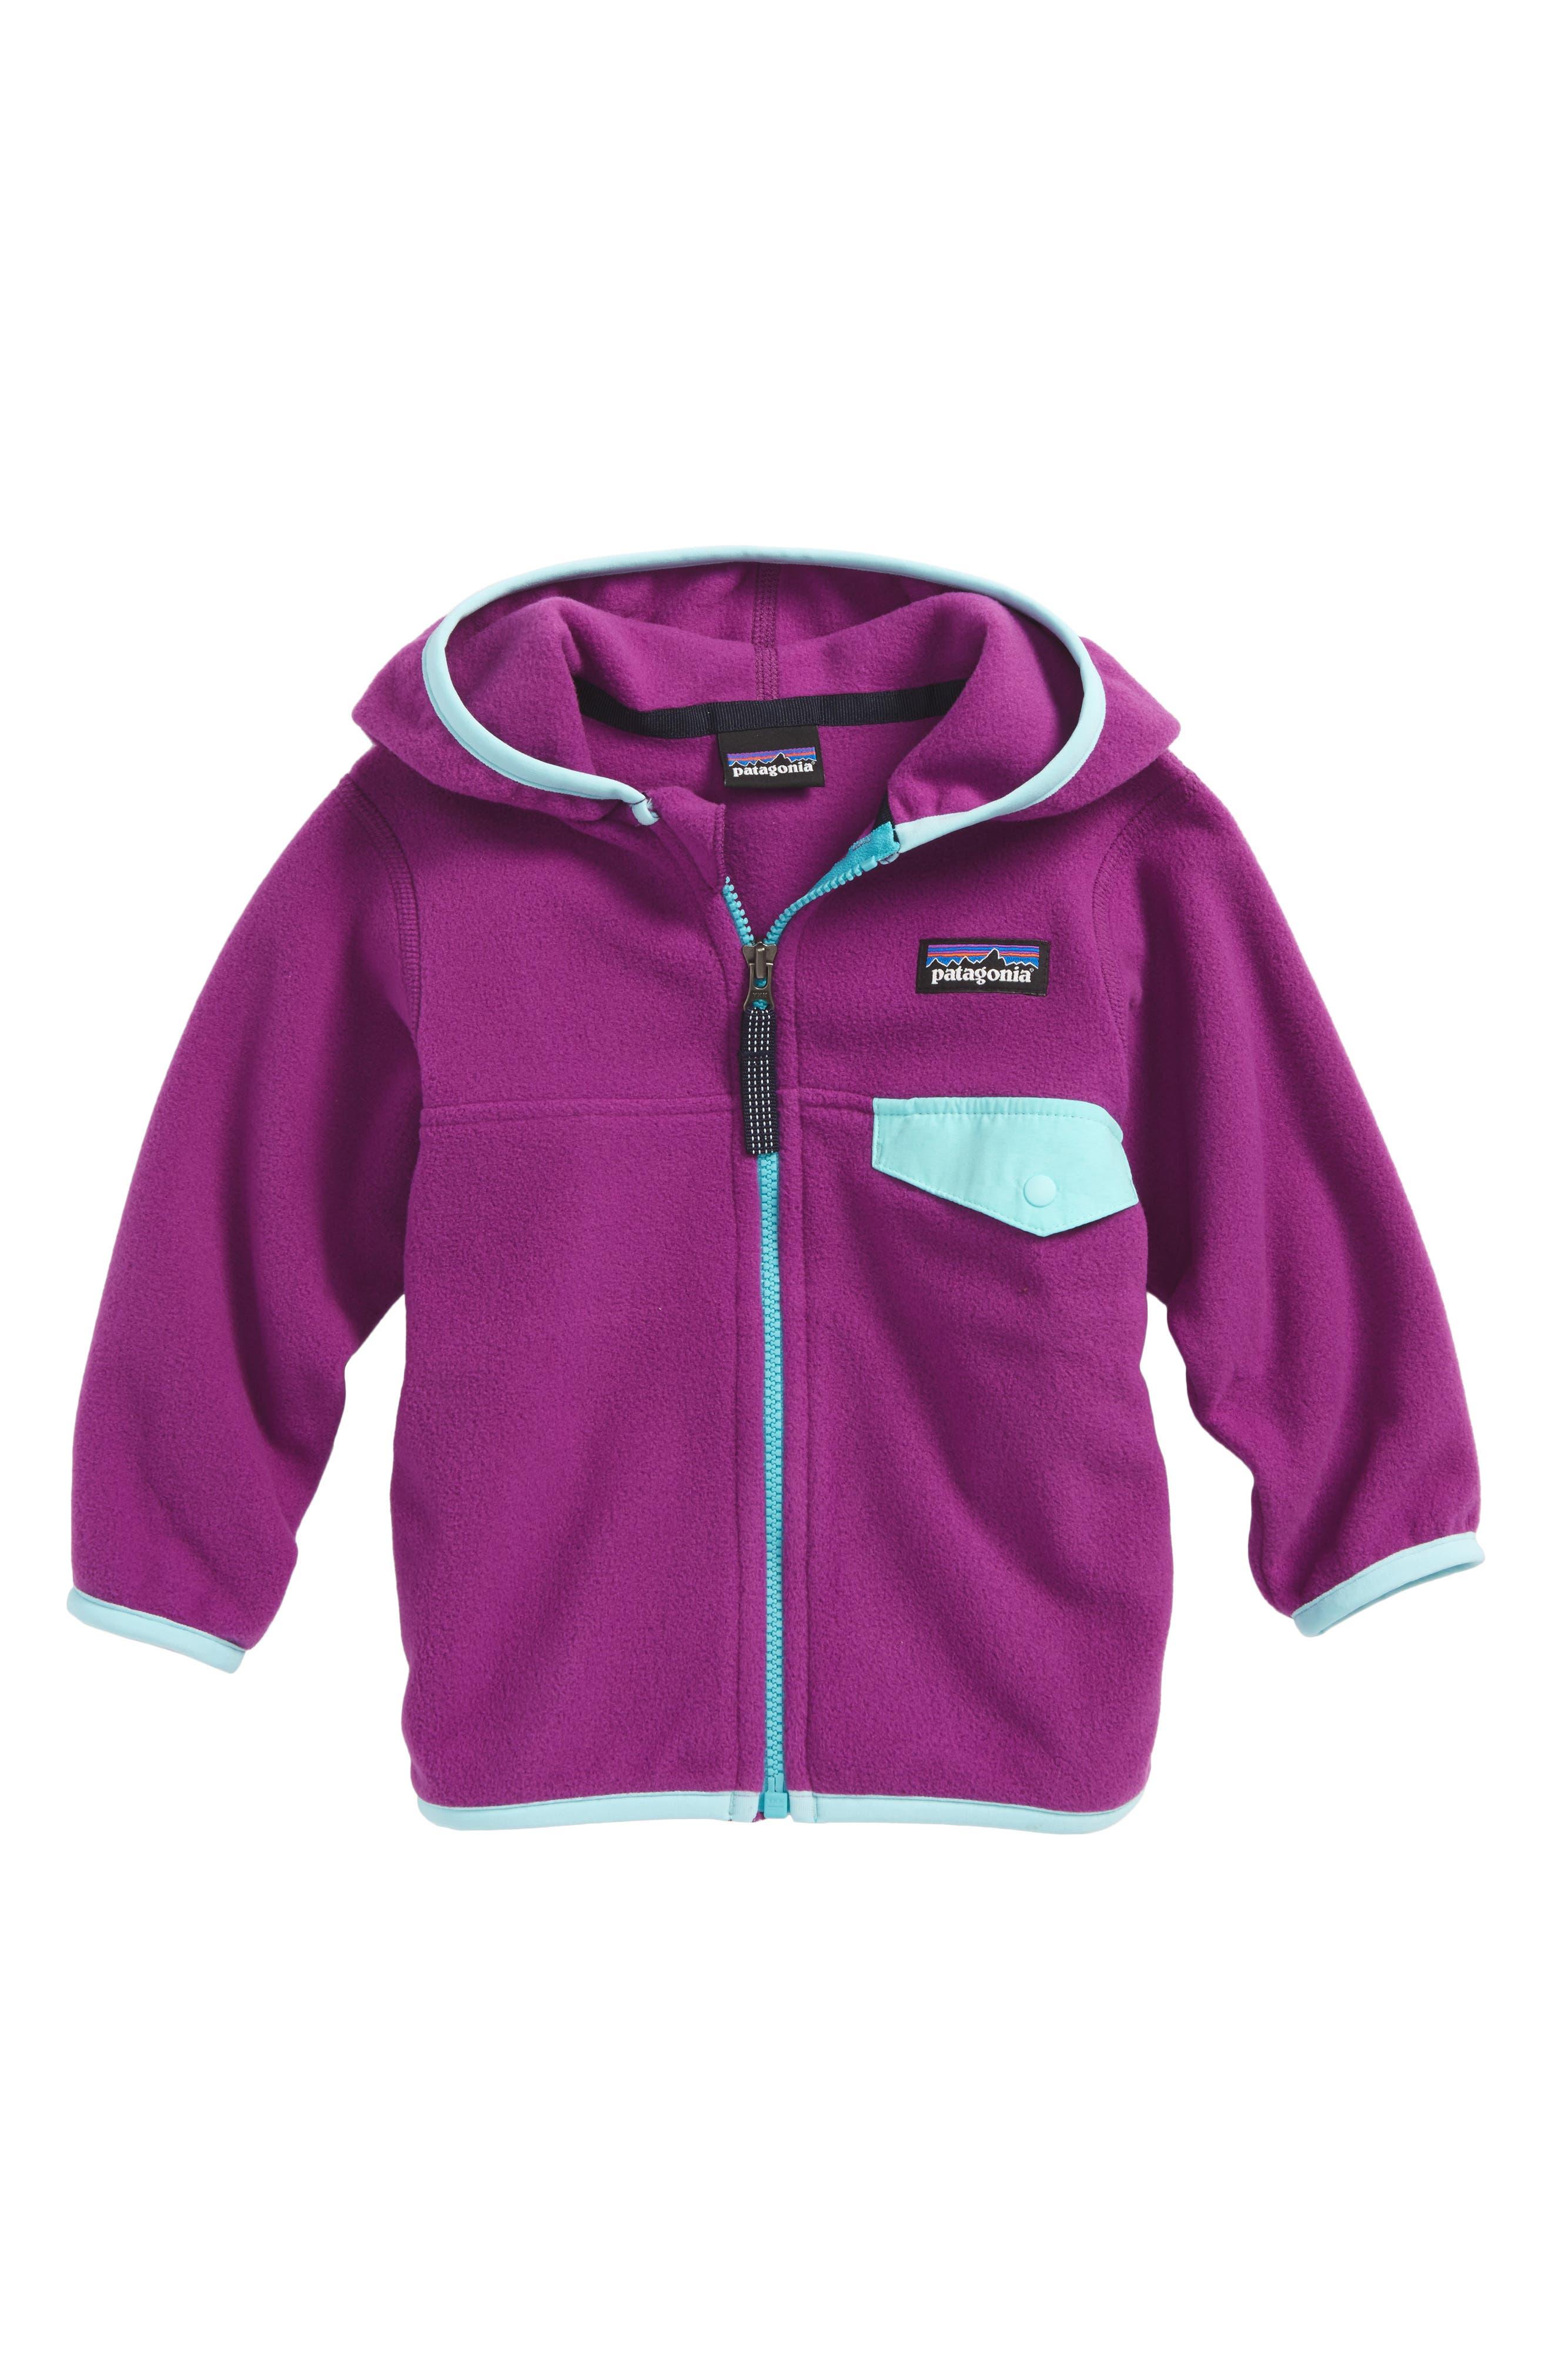 Micro D<sup>®</sup> Snap-T<sup>®</sup> Fleece Jacket,                         Main,                         color, Ikp Ikat Purple